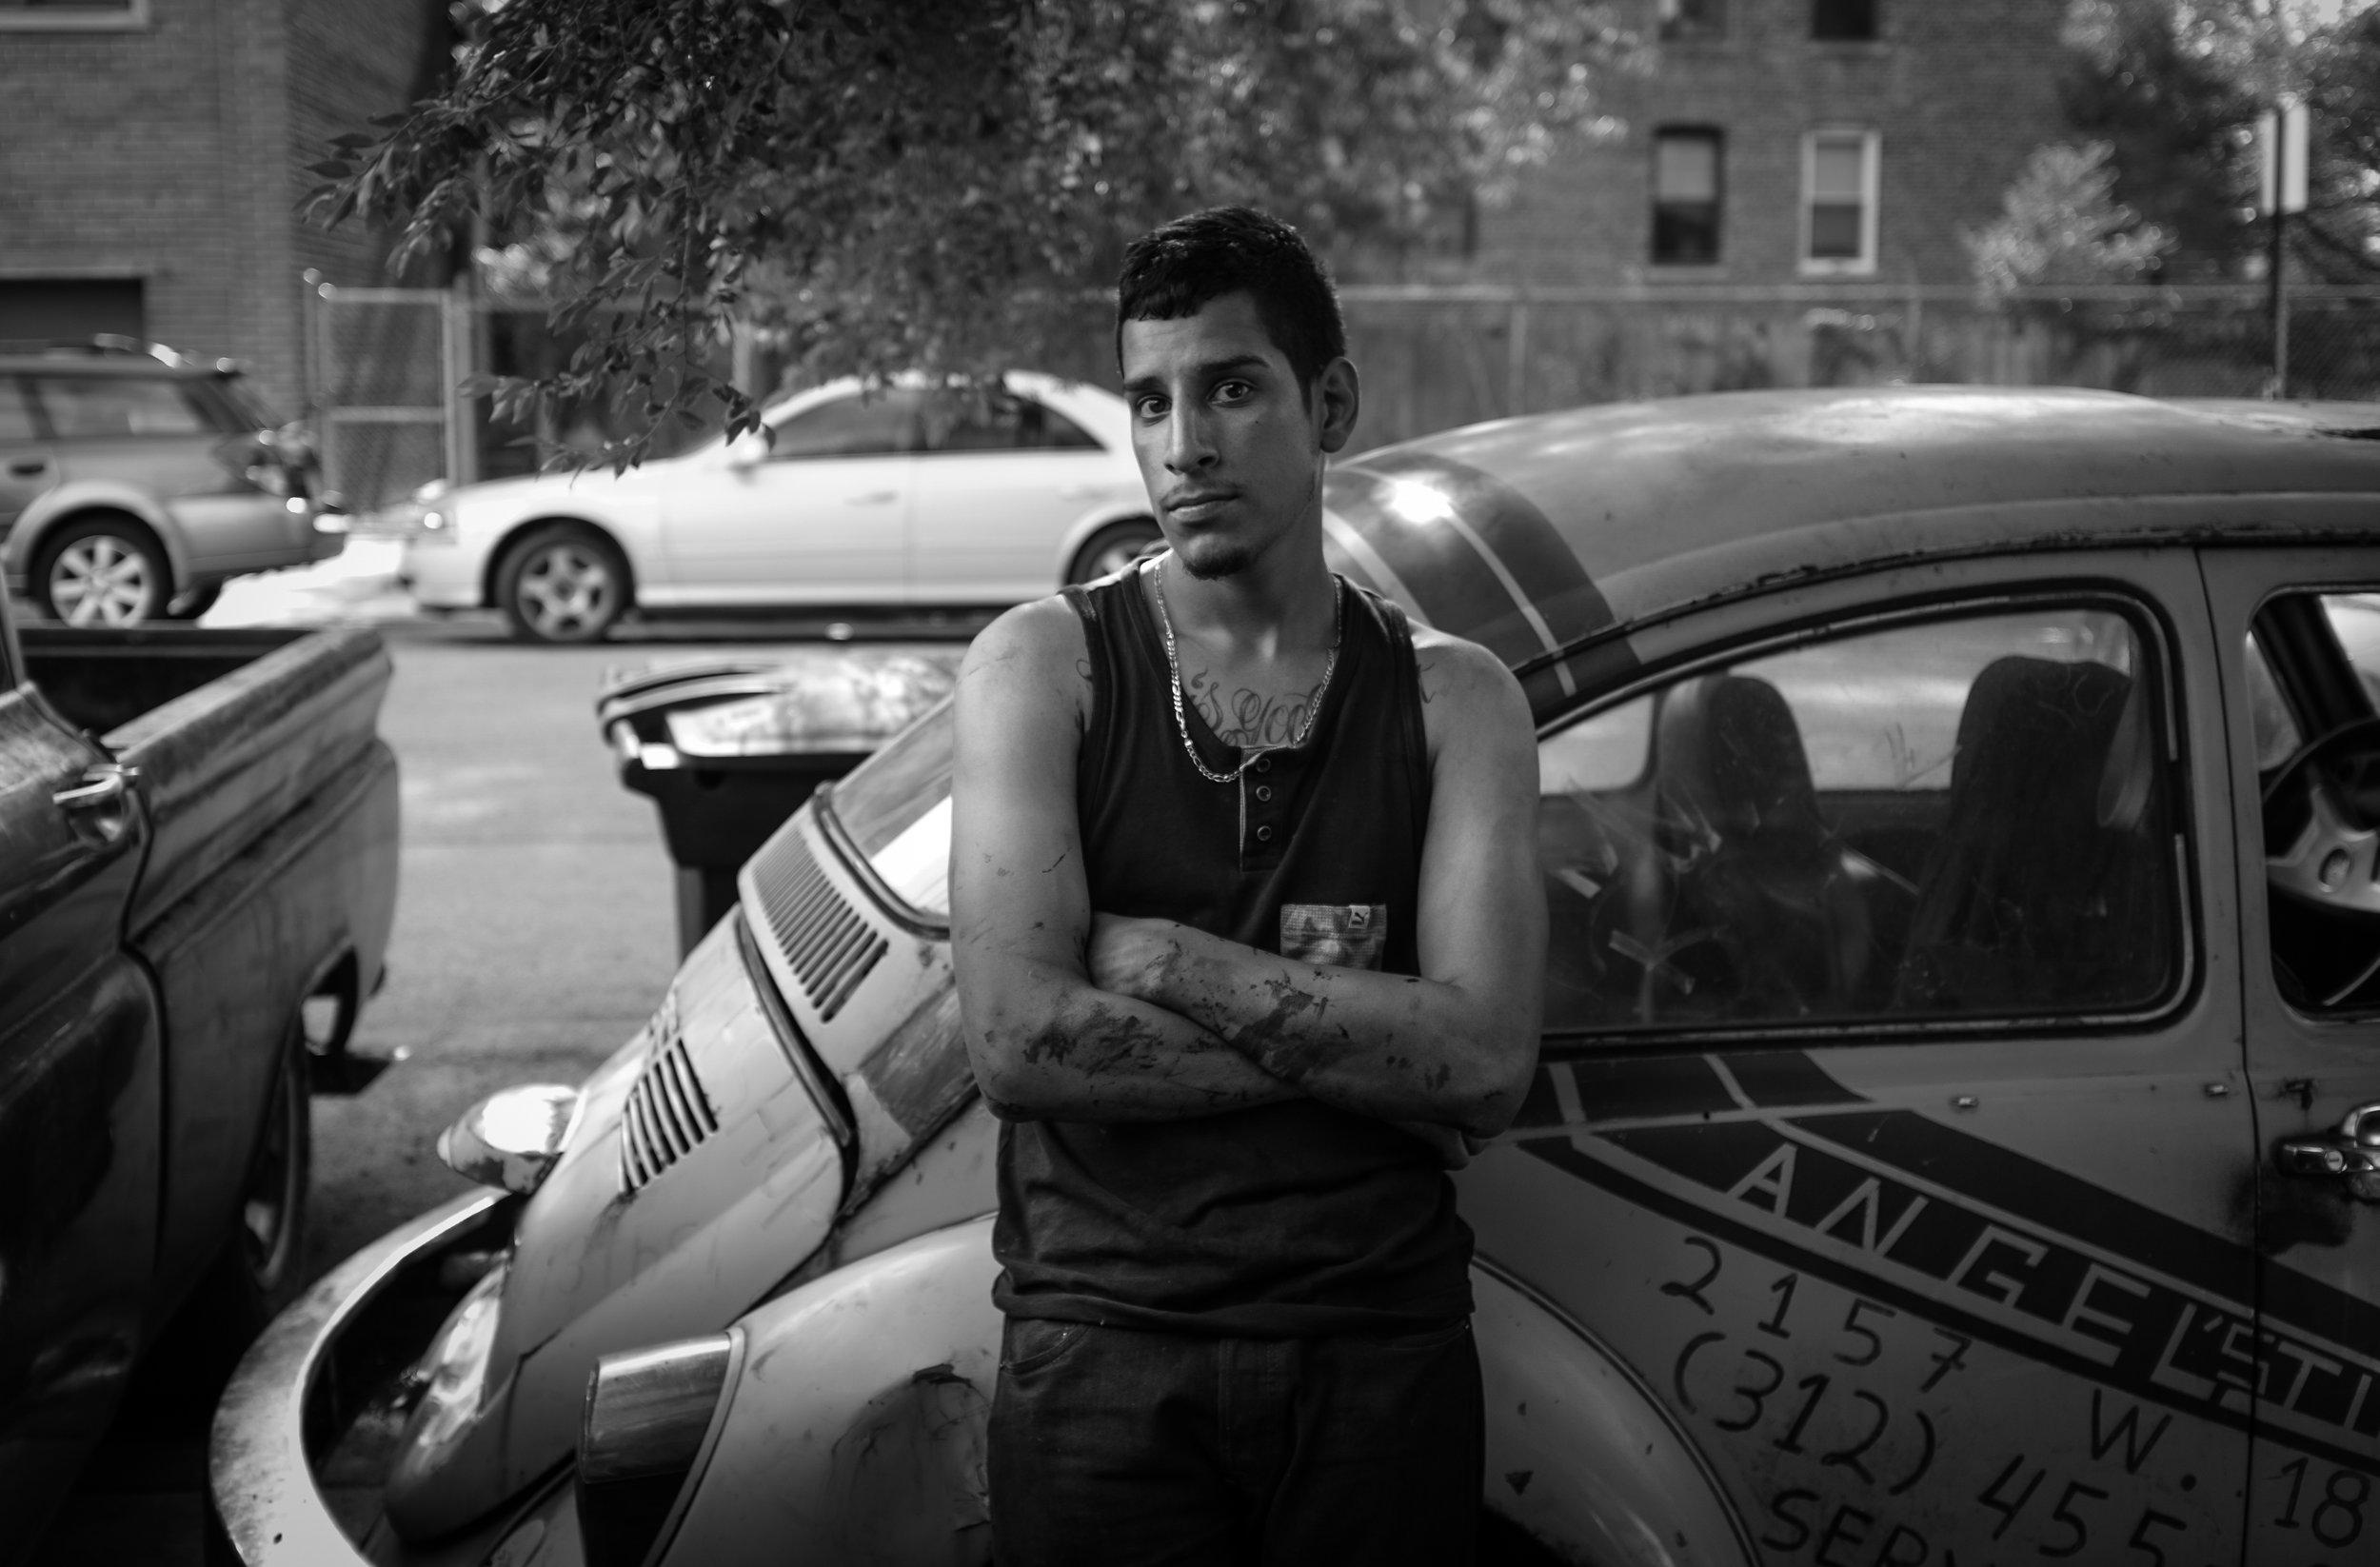 Jose Salgado, a longtime Pilsen resident and son of Angel Salgado, taking his break at Angel's Tire Shop, a staple of the community in 2016.